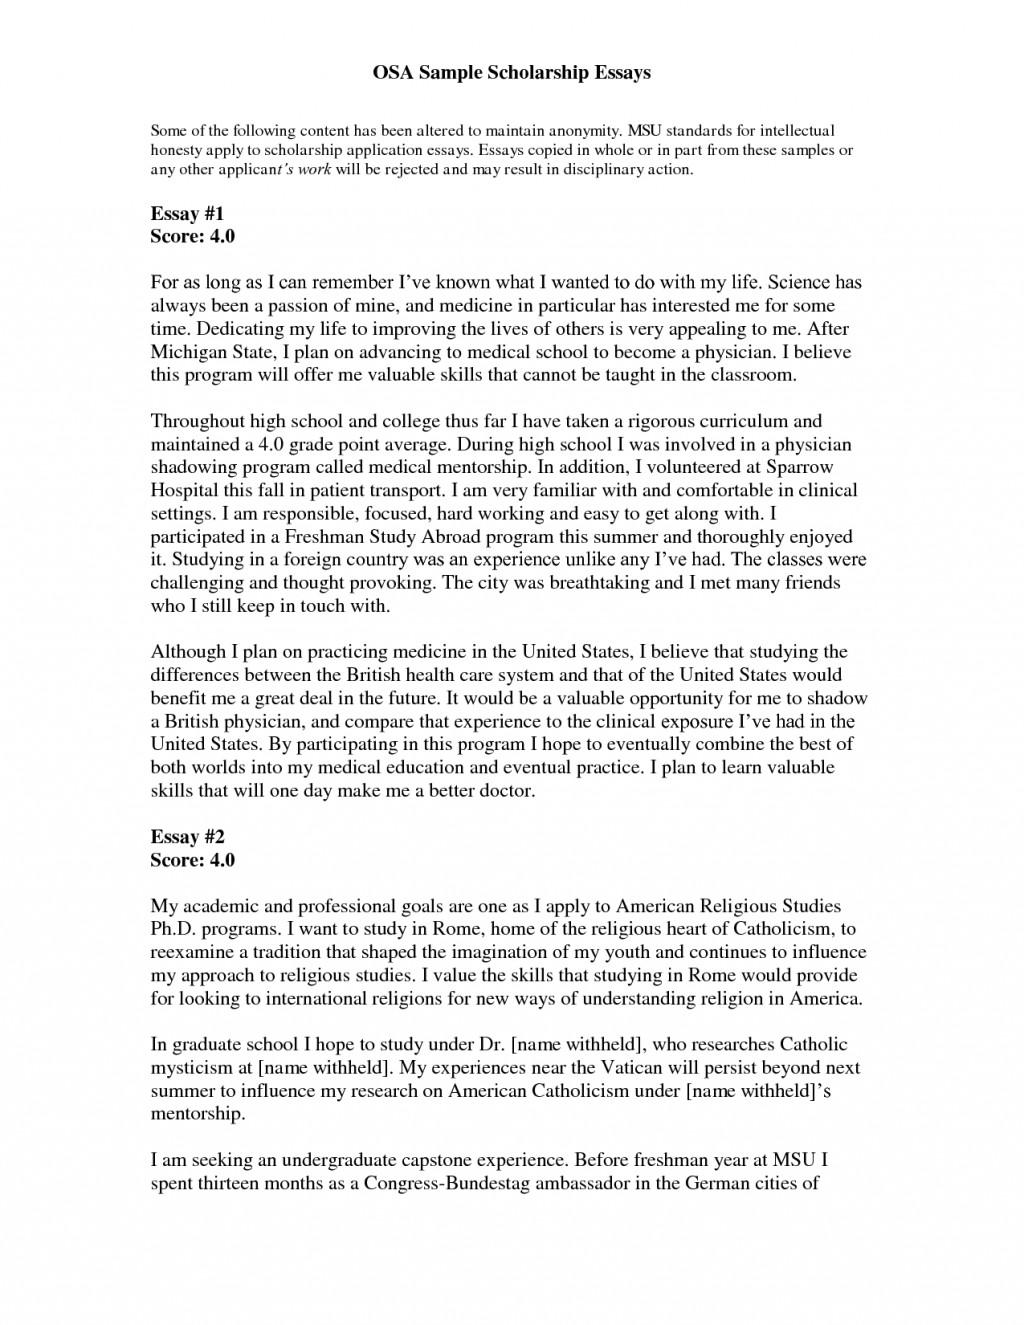 008 Ynt0sledfv Sample Essay For Scholarship Incredible Mara Personal Pdf Large